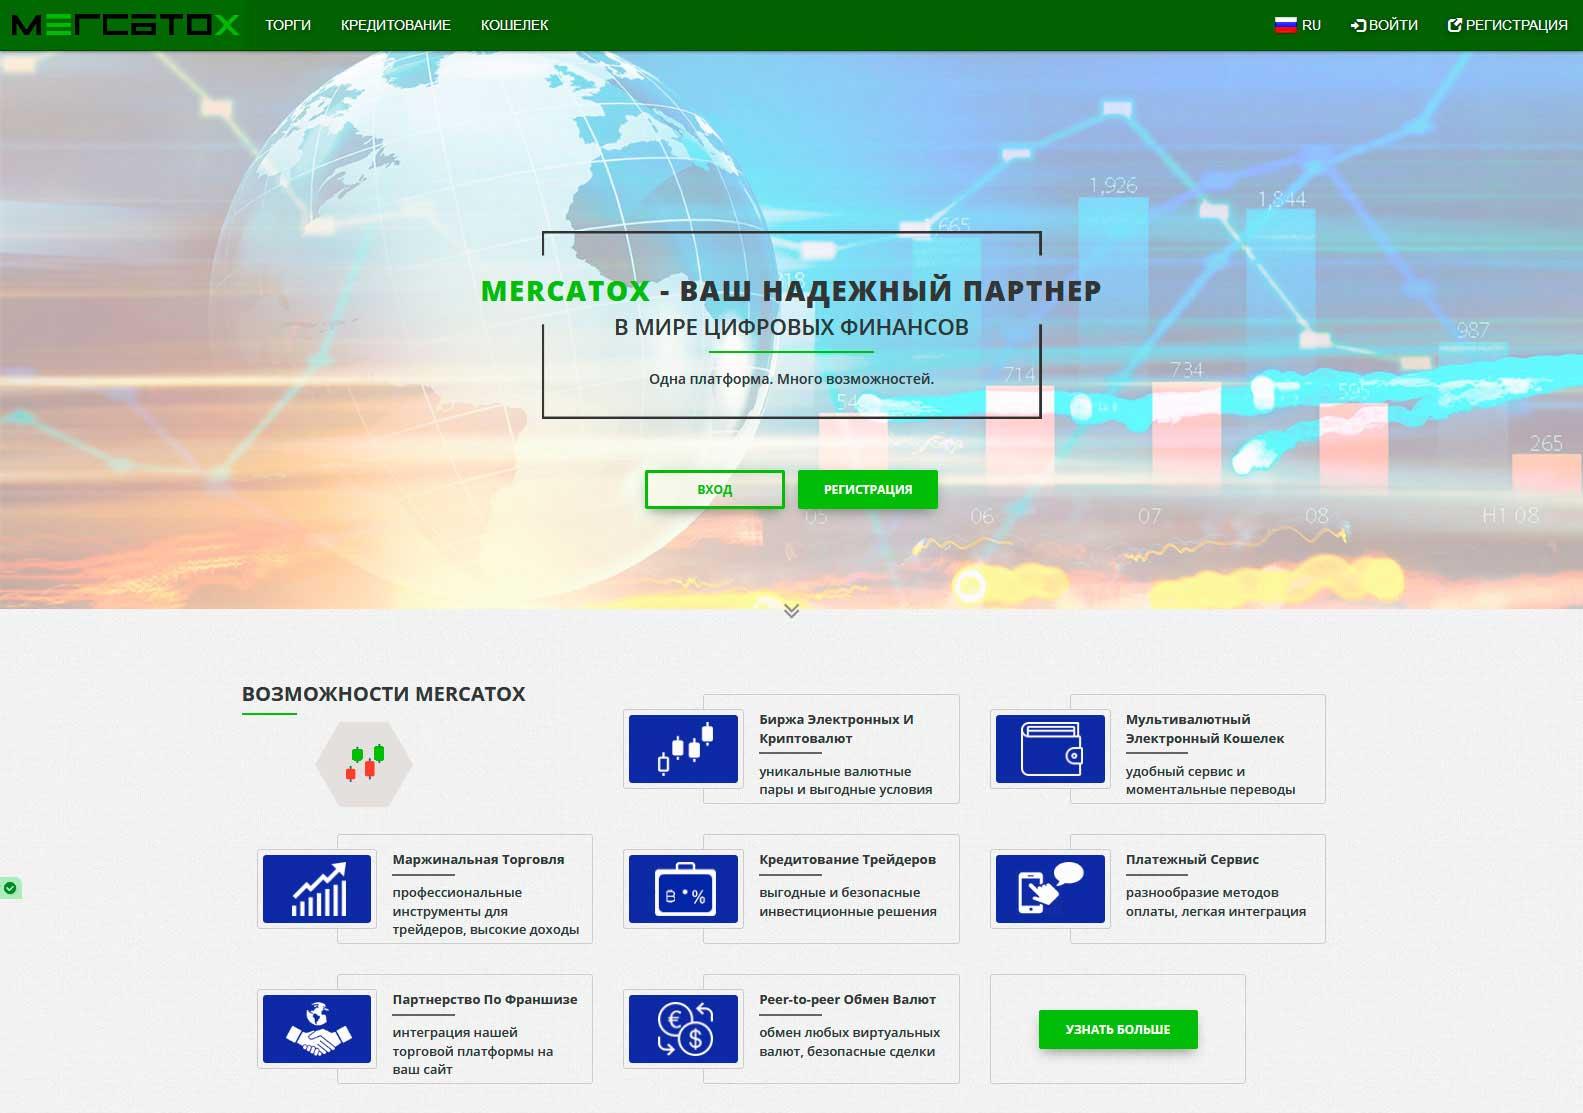 mercatox официальный сайт